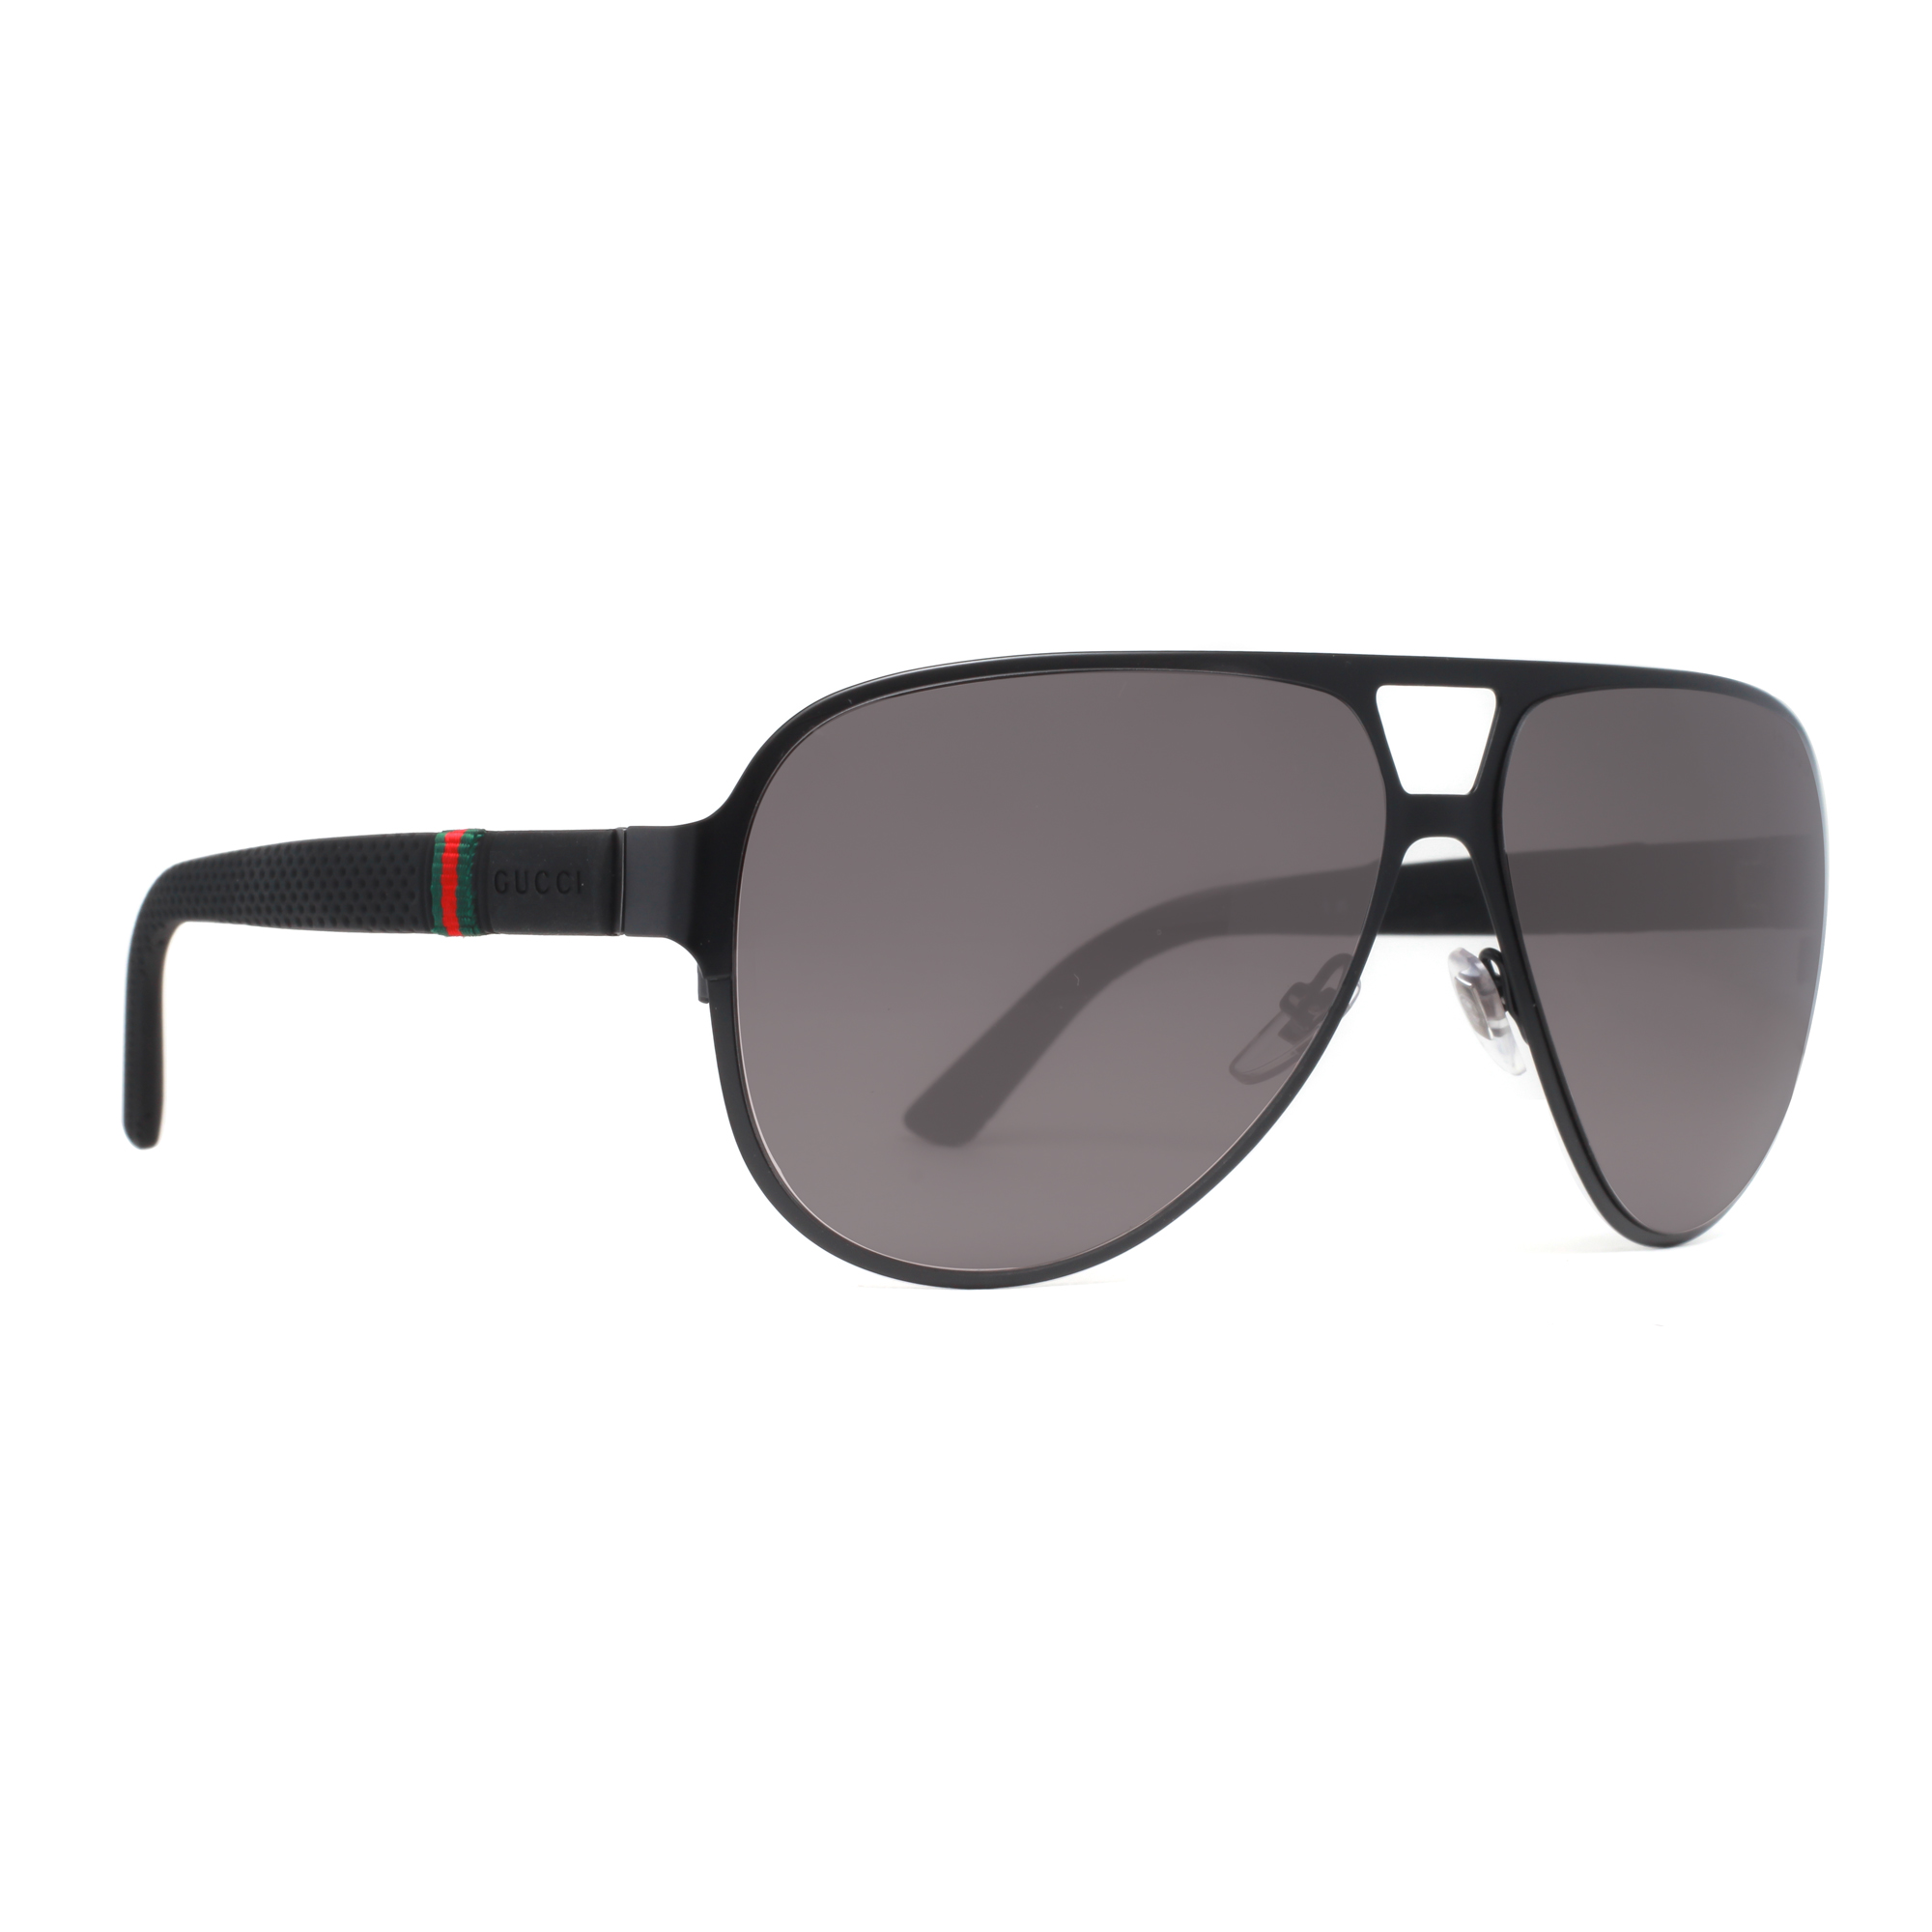 06c6111682a79 Gucci - GG 2252 S M7AEU Matte Black GG2252 S Unisex Aviator Sunglasses -  Walmart.com